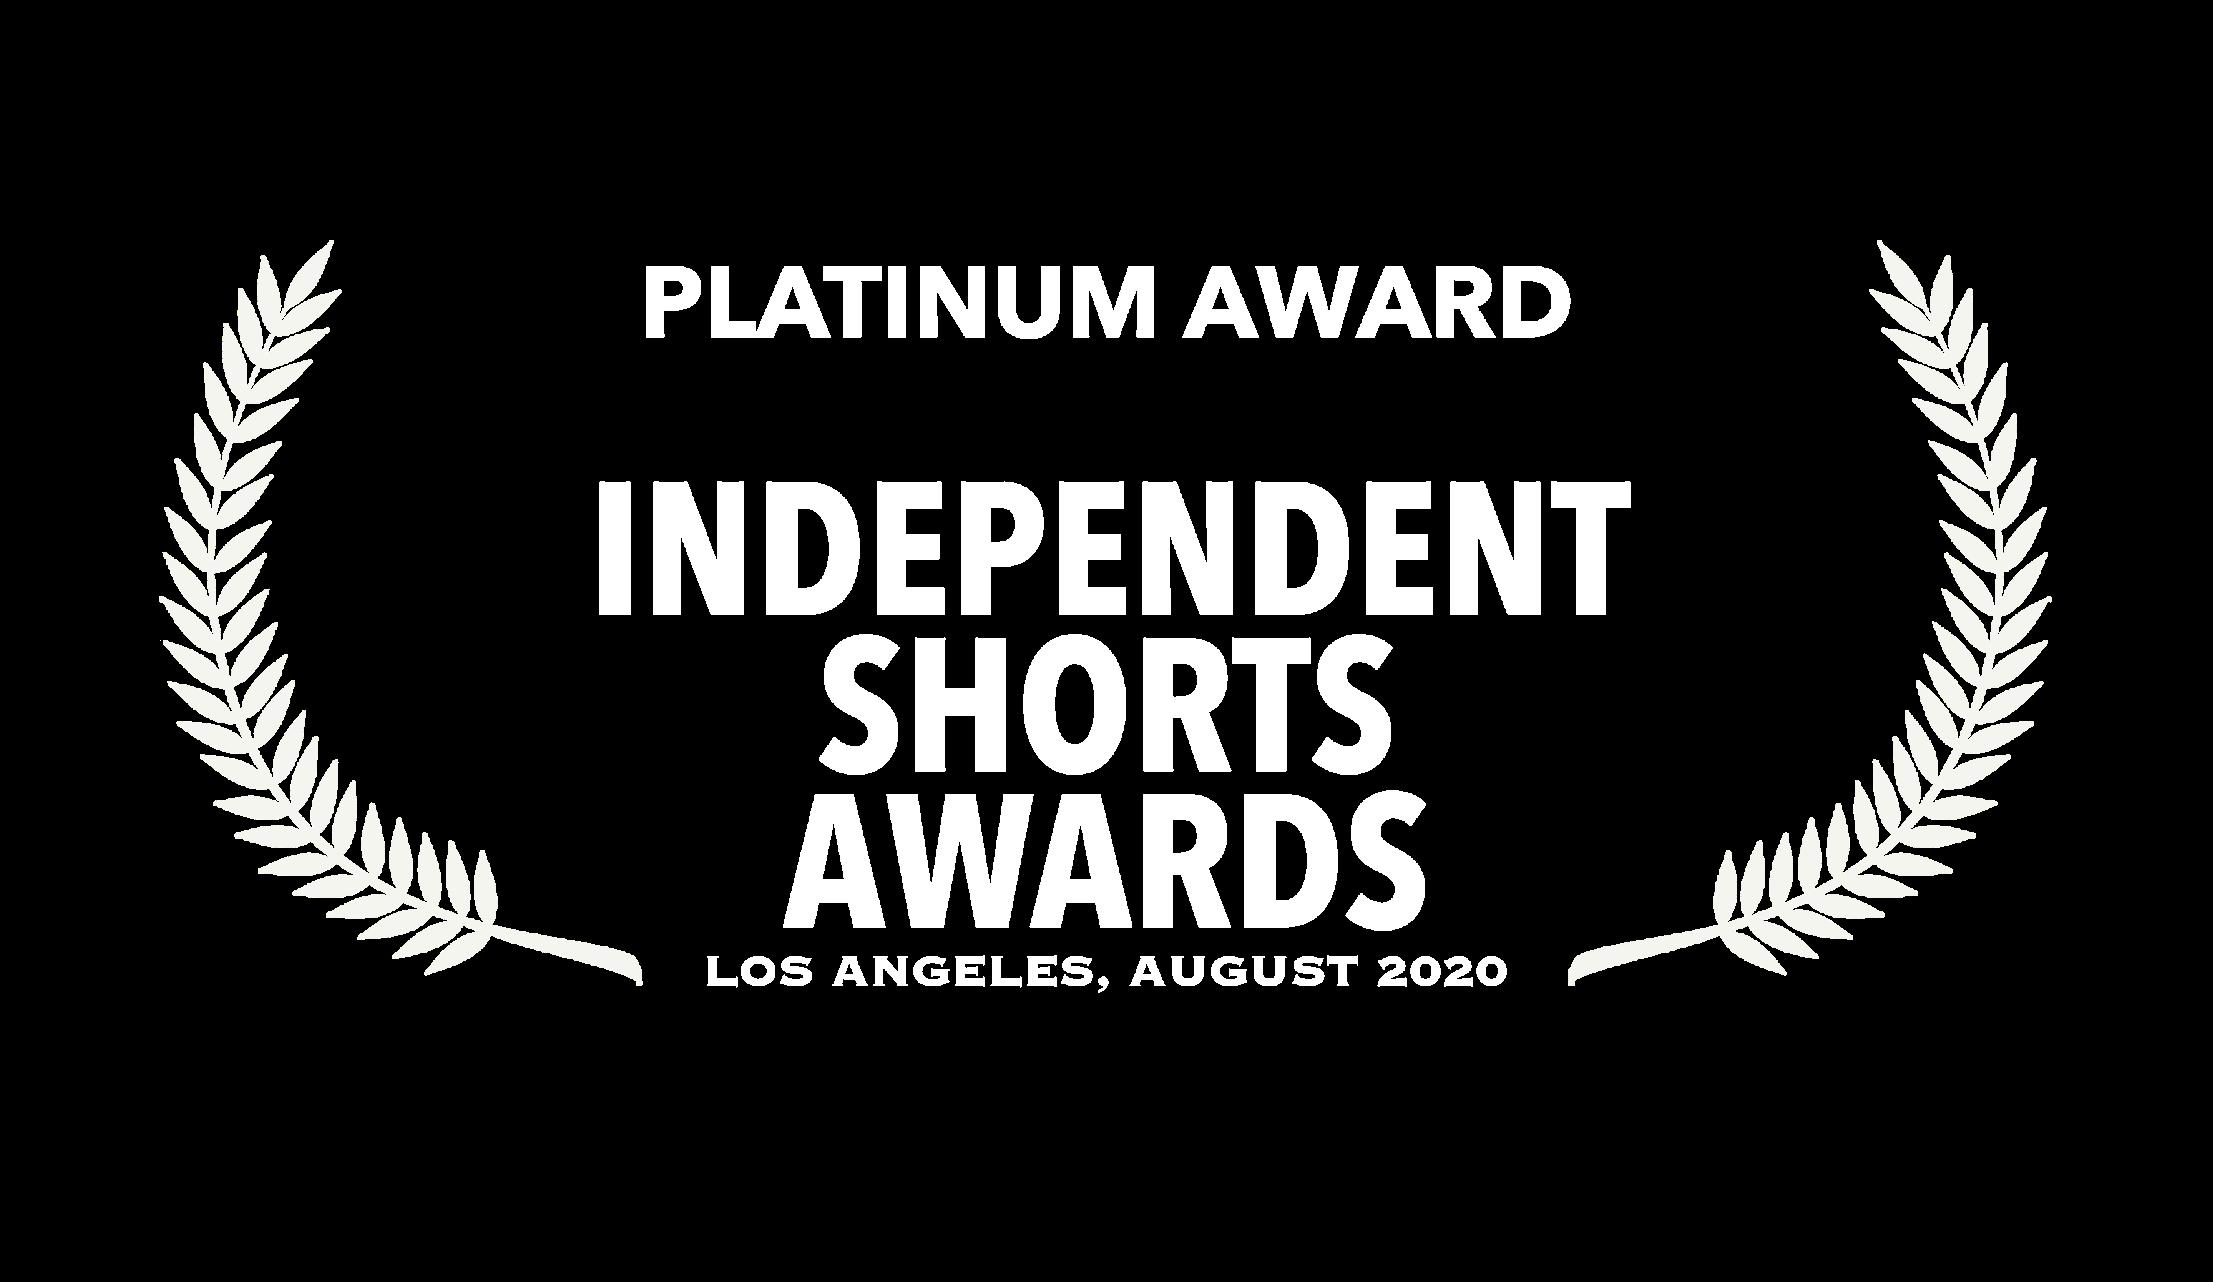 Independent Shorts Awards Platinum Winner